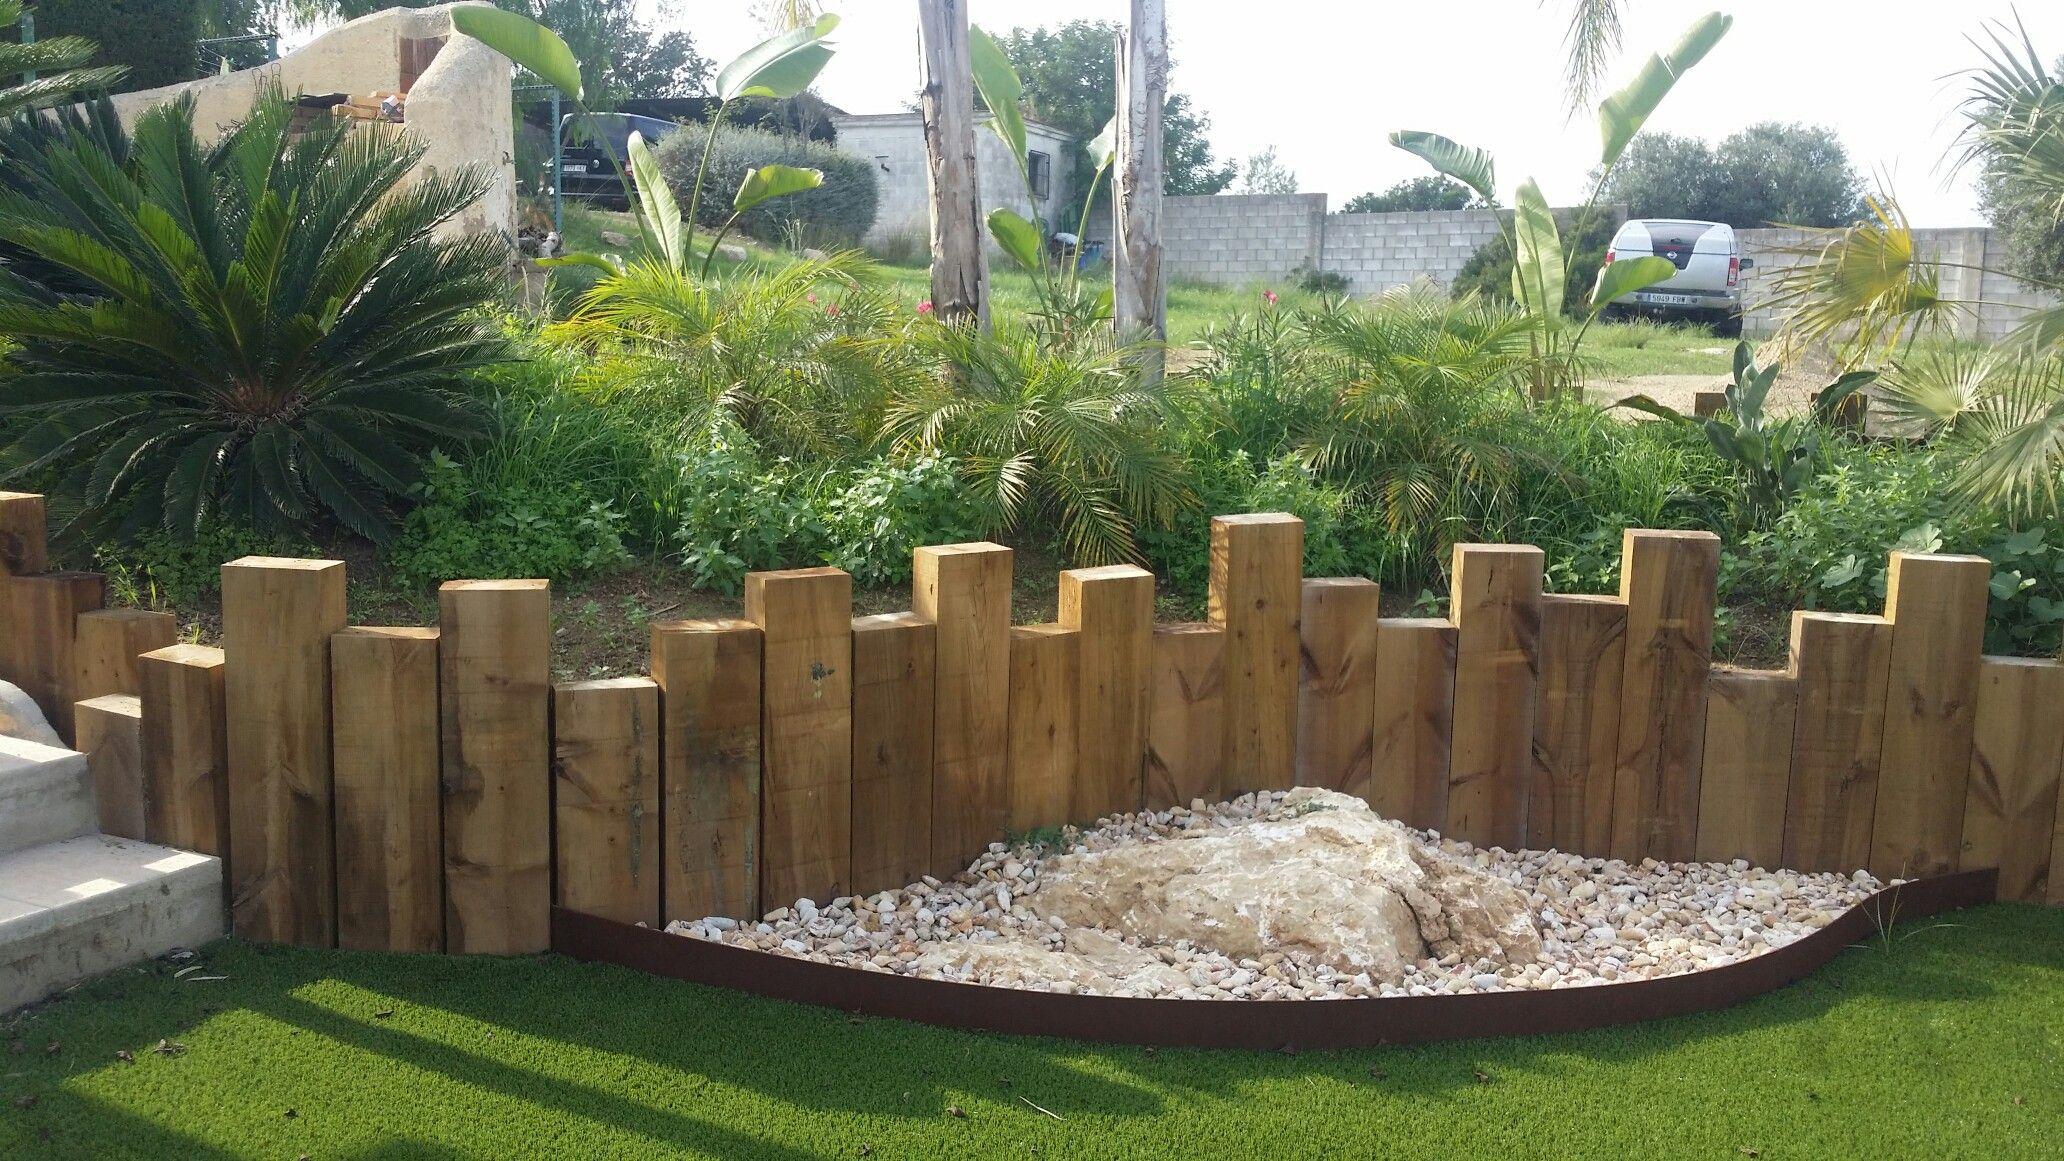 Gardens with good ideas